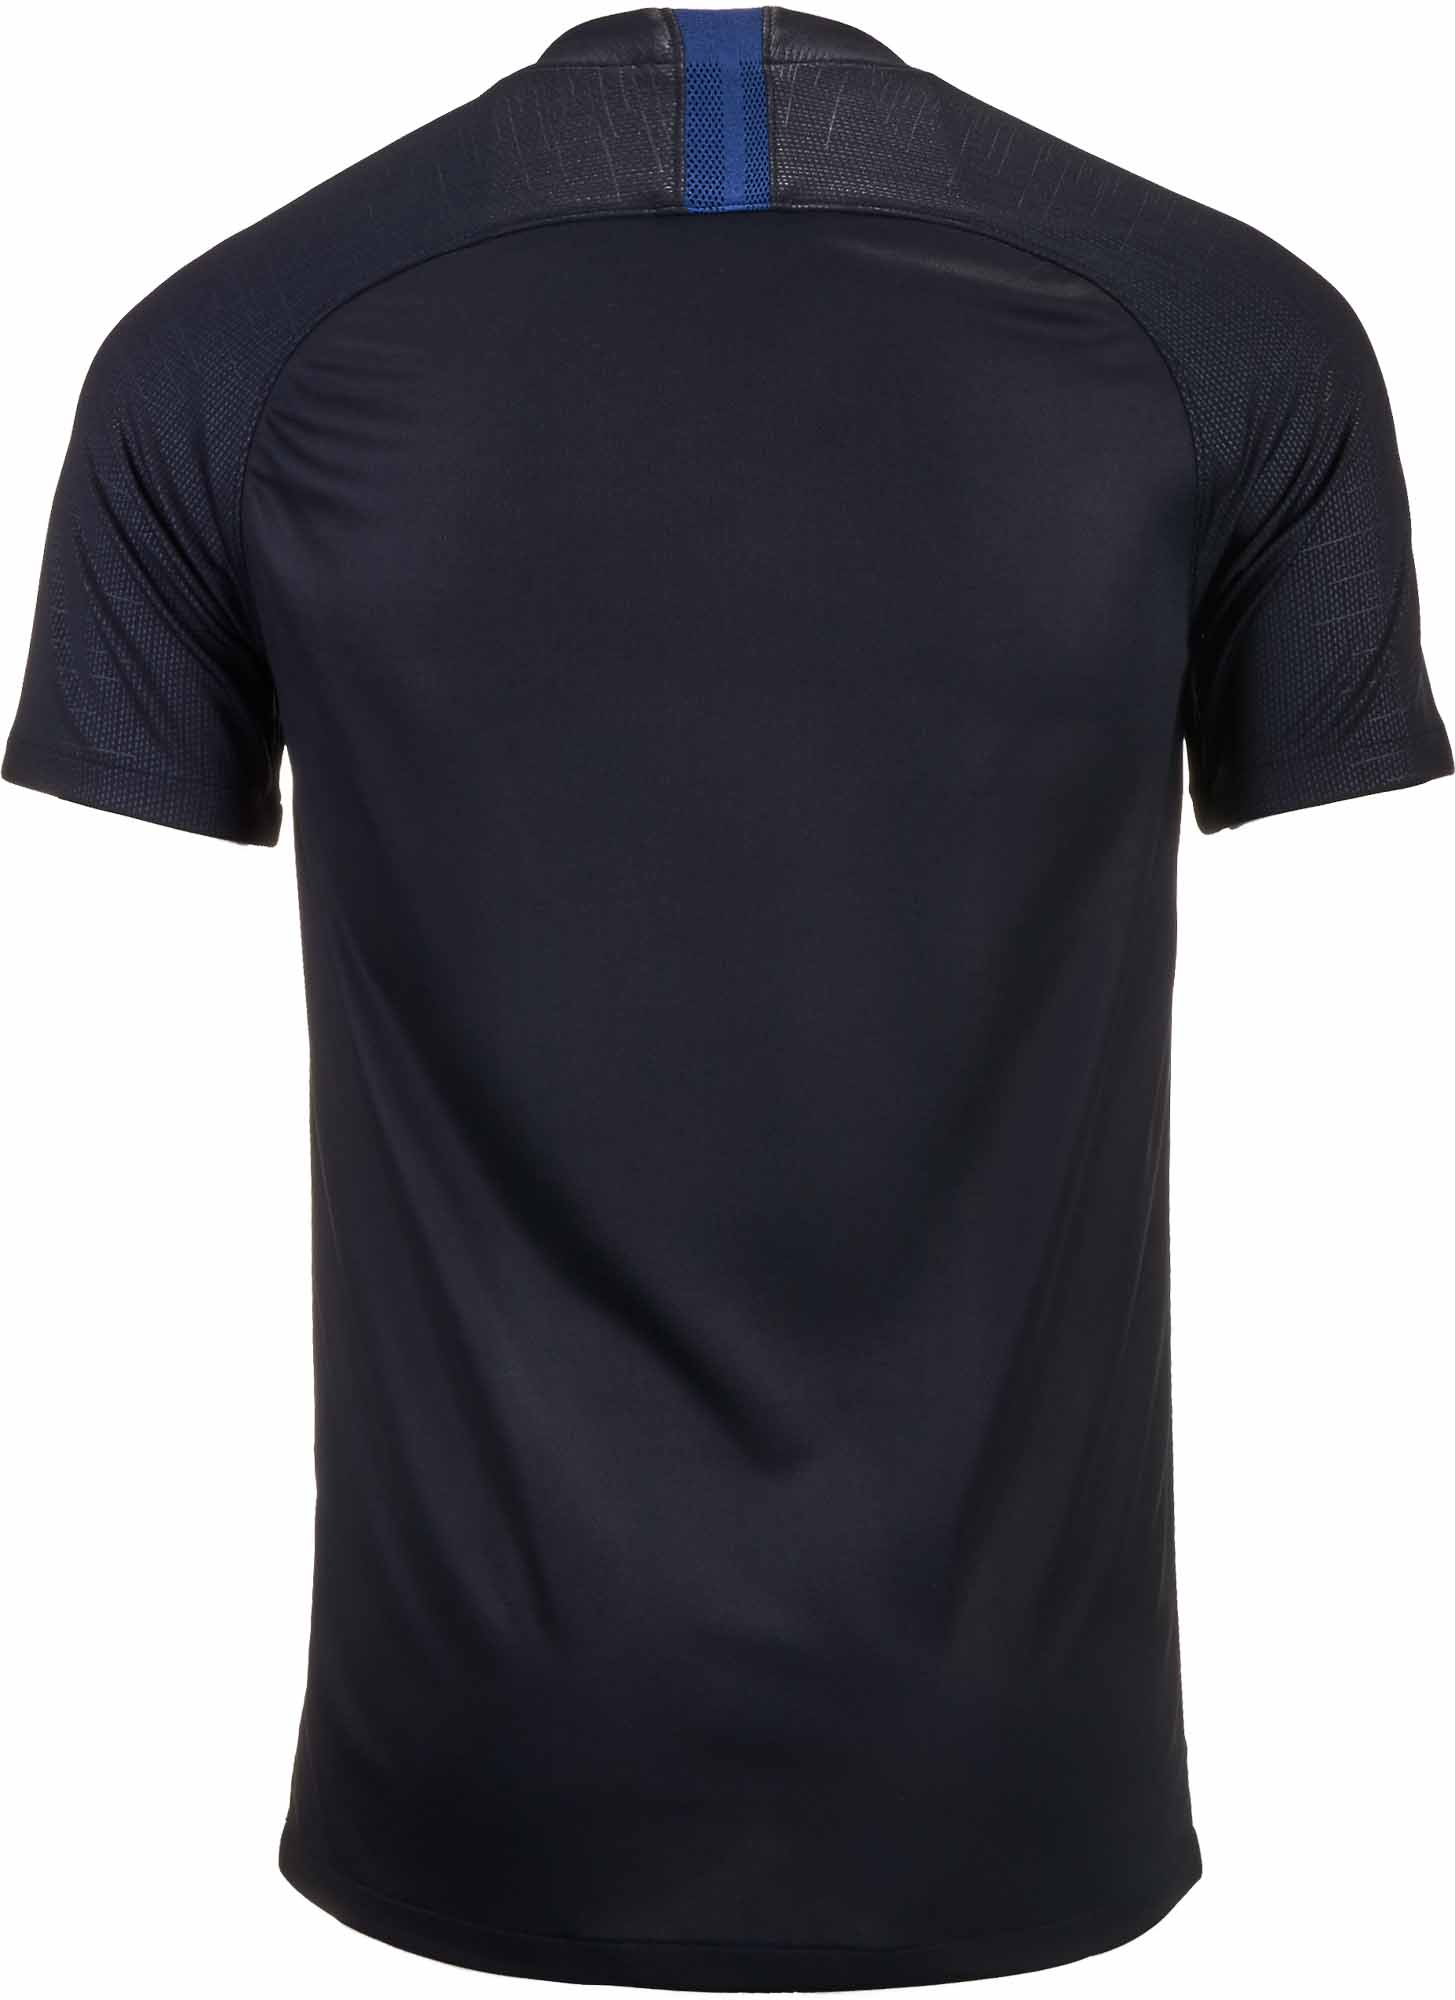 7e8c88bb8 Nike Croatia Away Jersey 2018-19 - SoccerPro.com